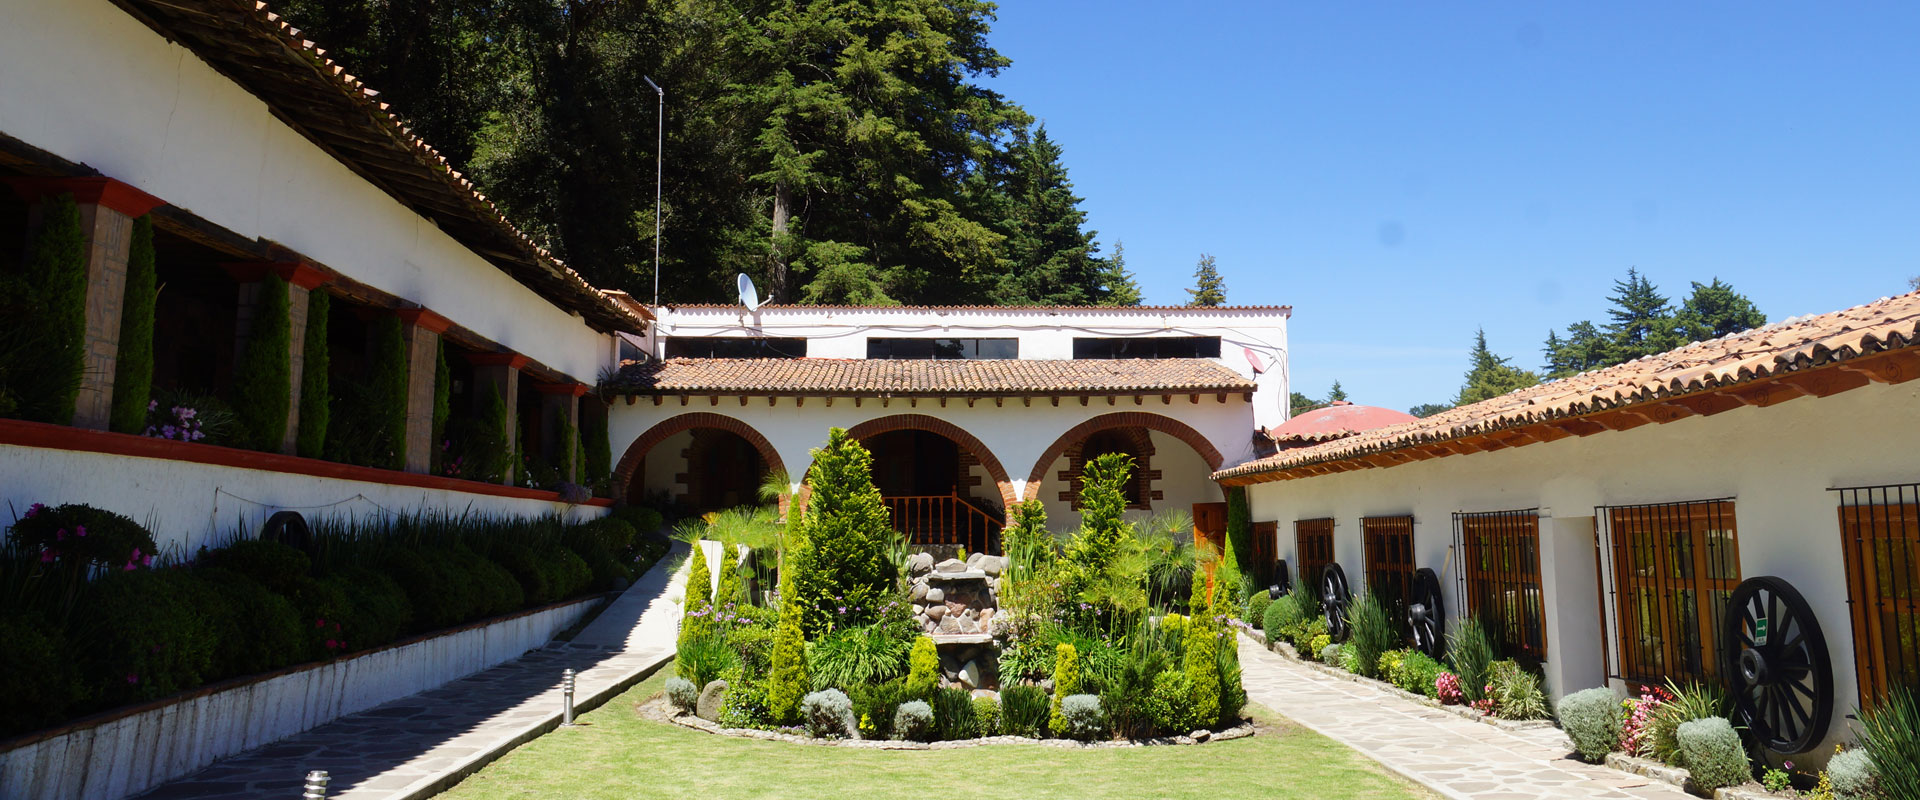 Las Cascadas Ecoturistico Villa chapa de Mota